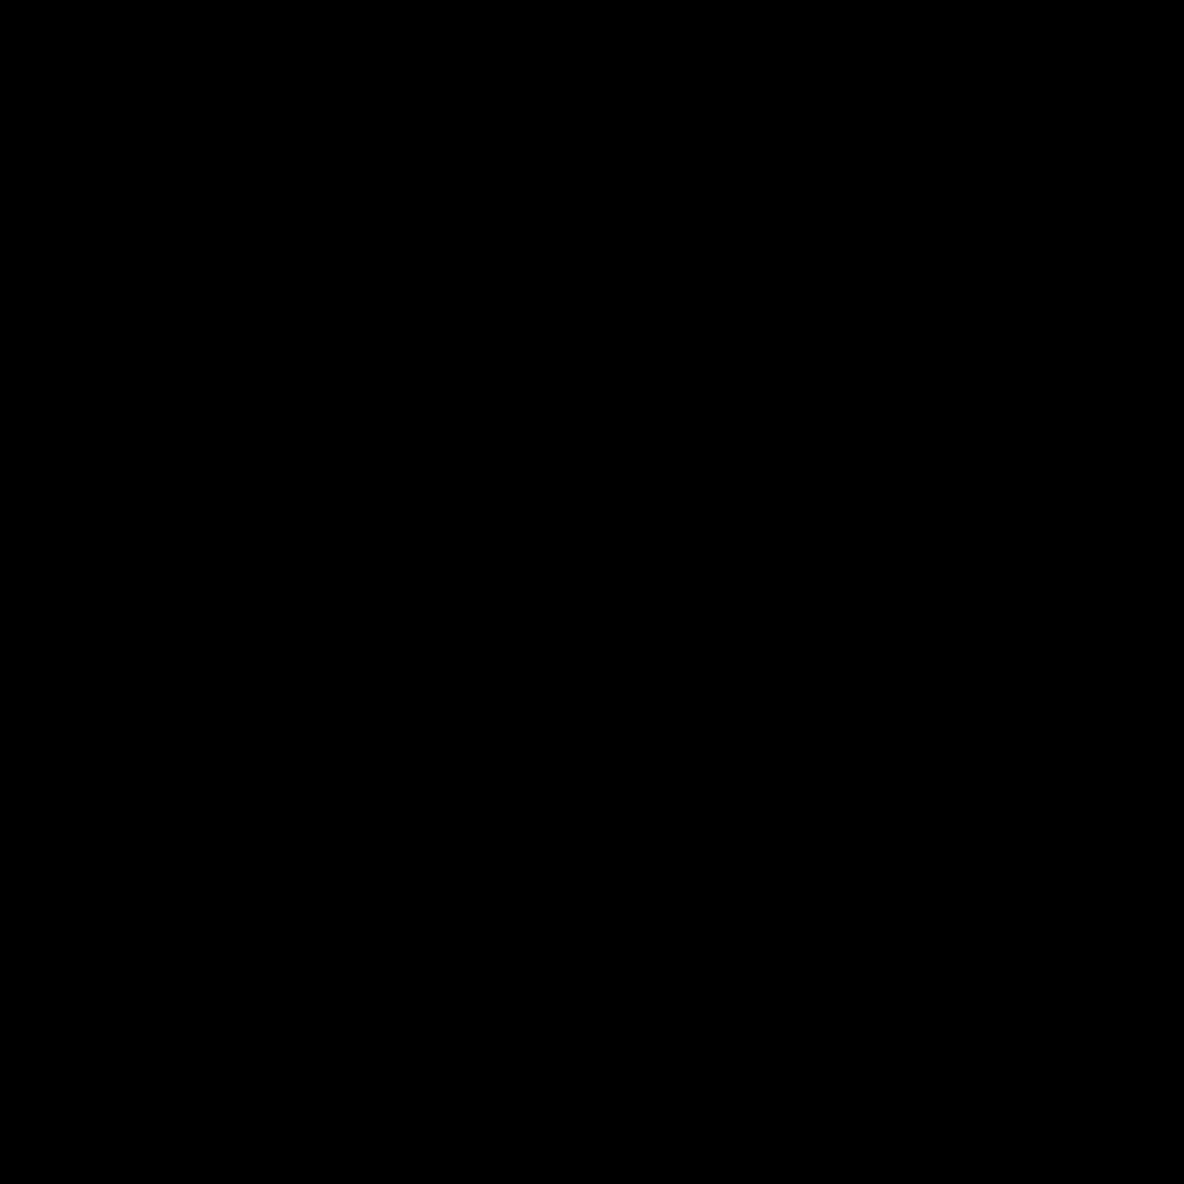 Pixilart Deathly Hallows Symbol By Hawko876